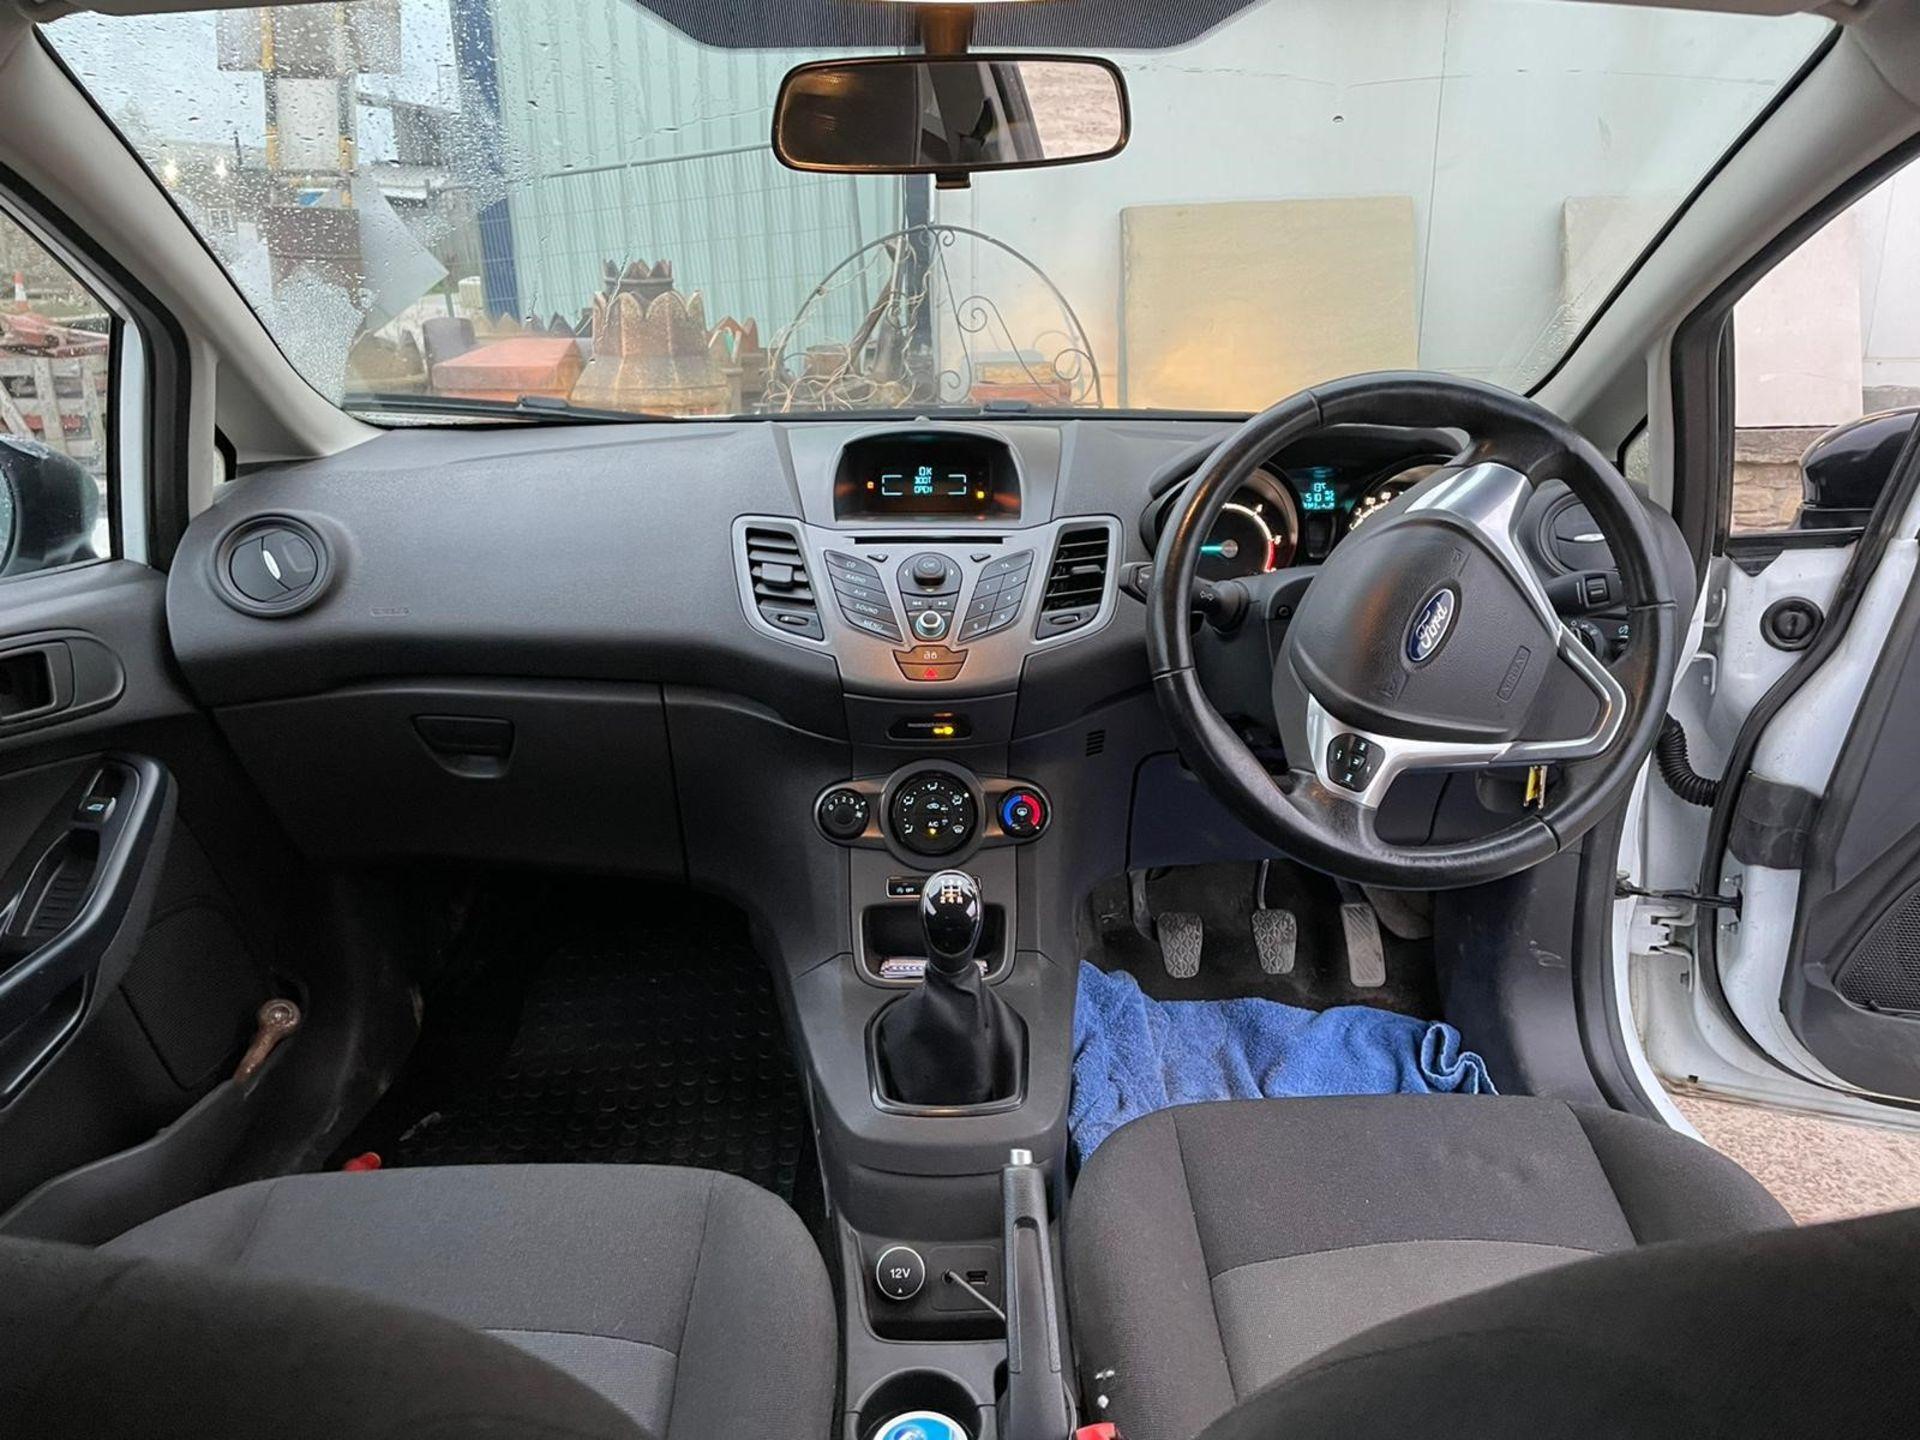 Ford Fiesta Econetic Tech TDCI Diesel Car Derived Van, registration no. YR14 XGW, date first - Image 5 of 5